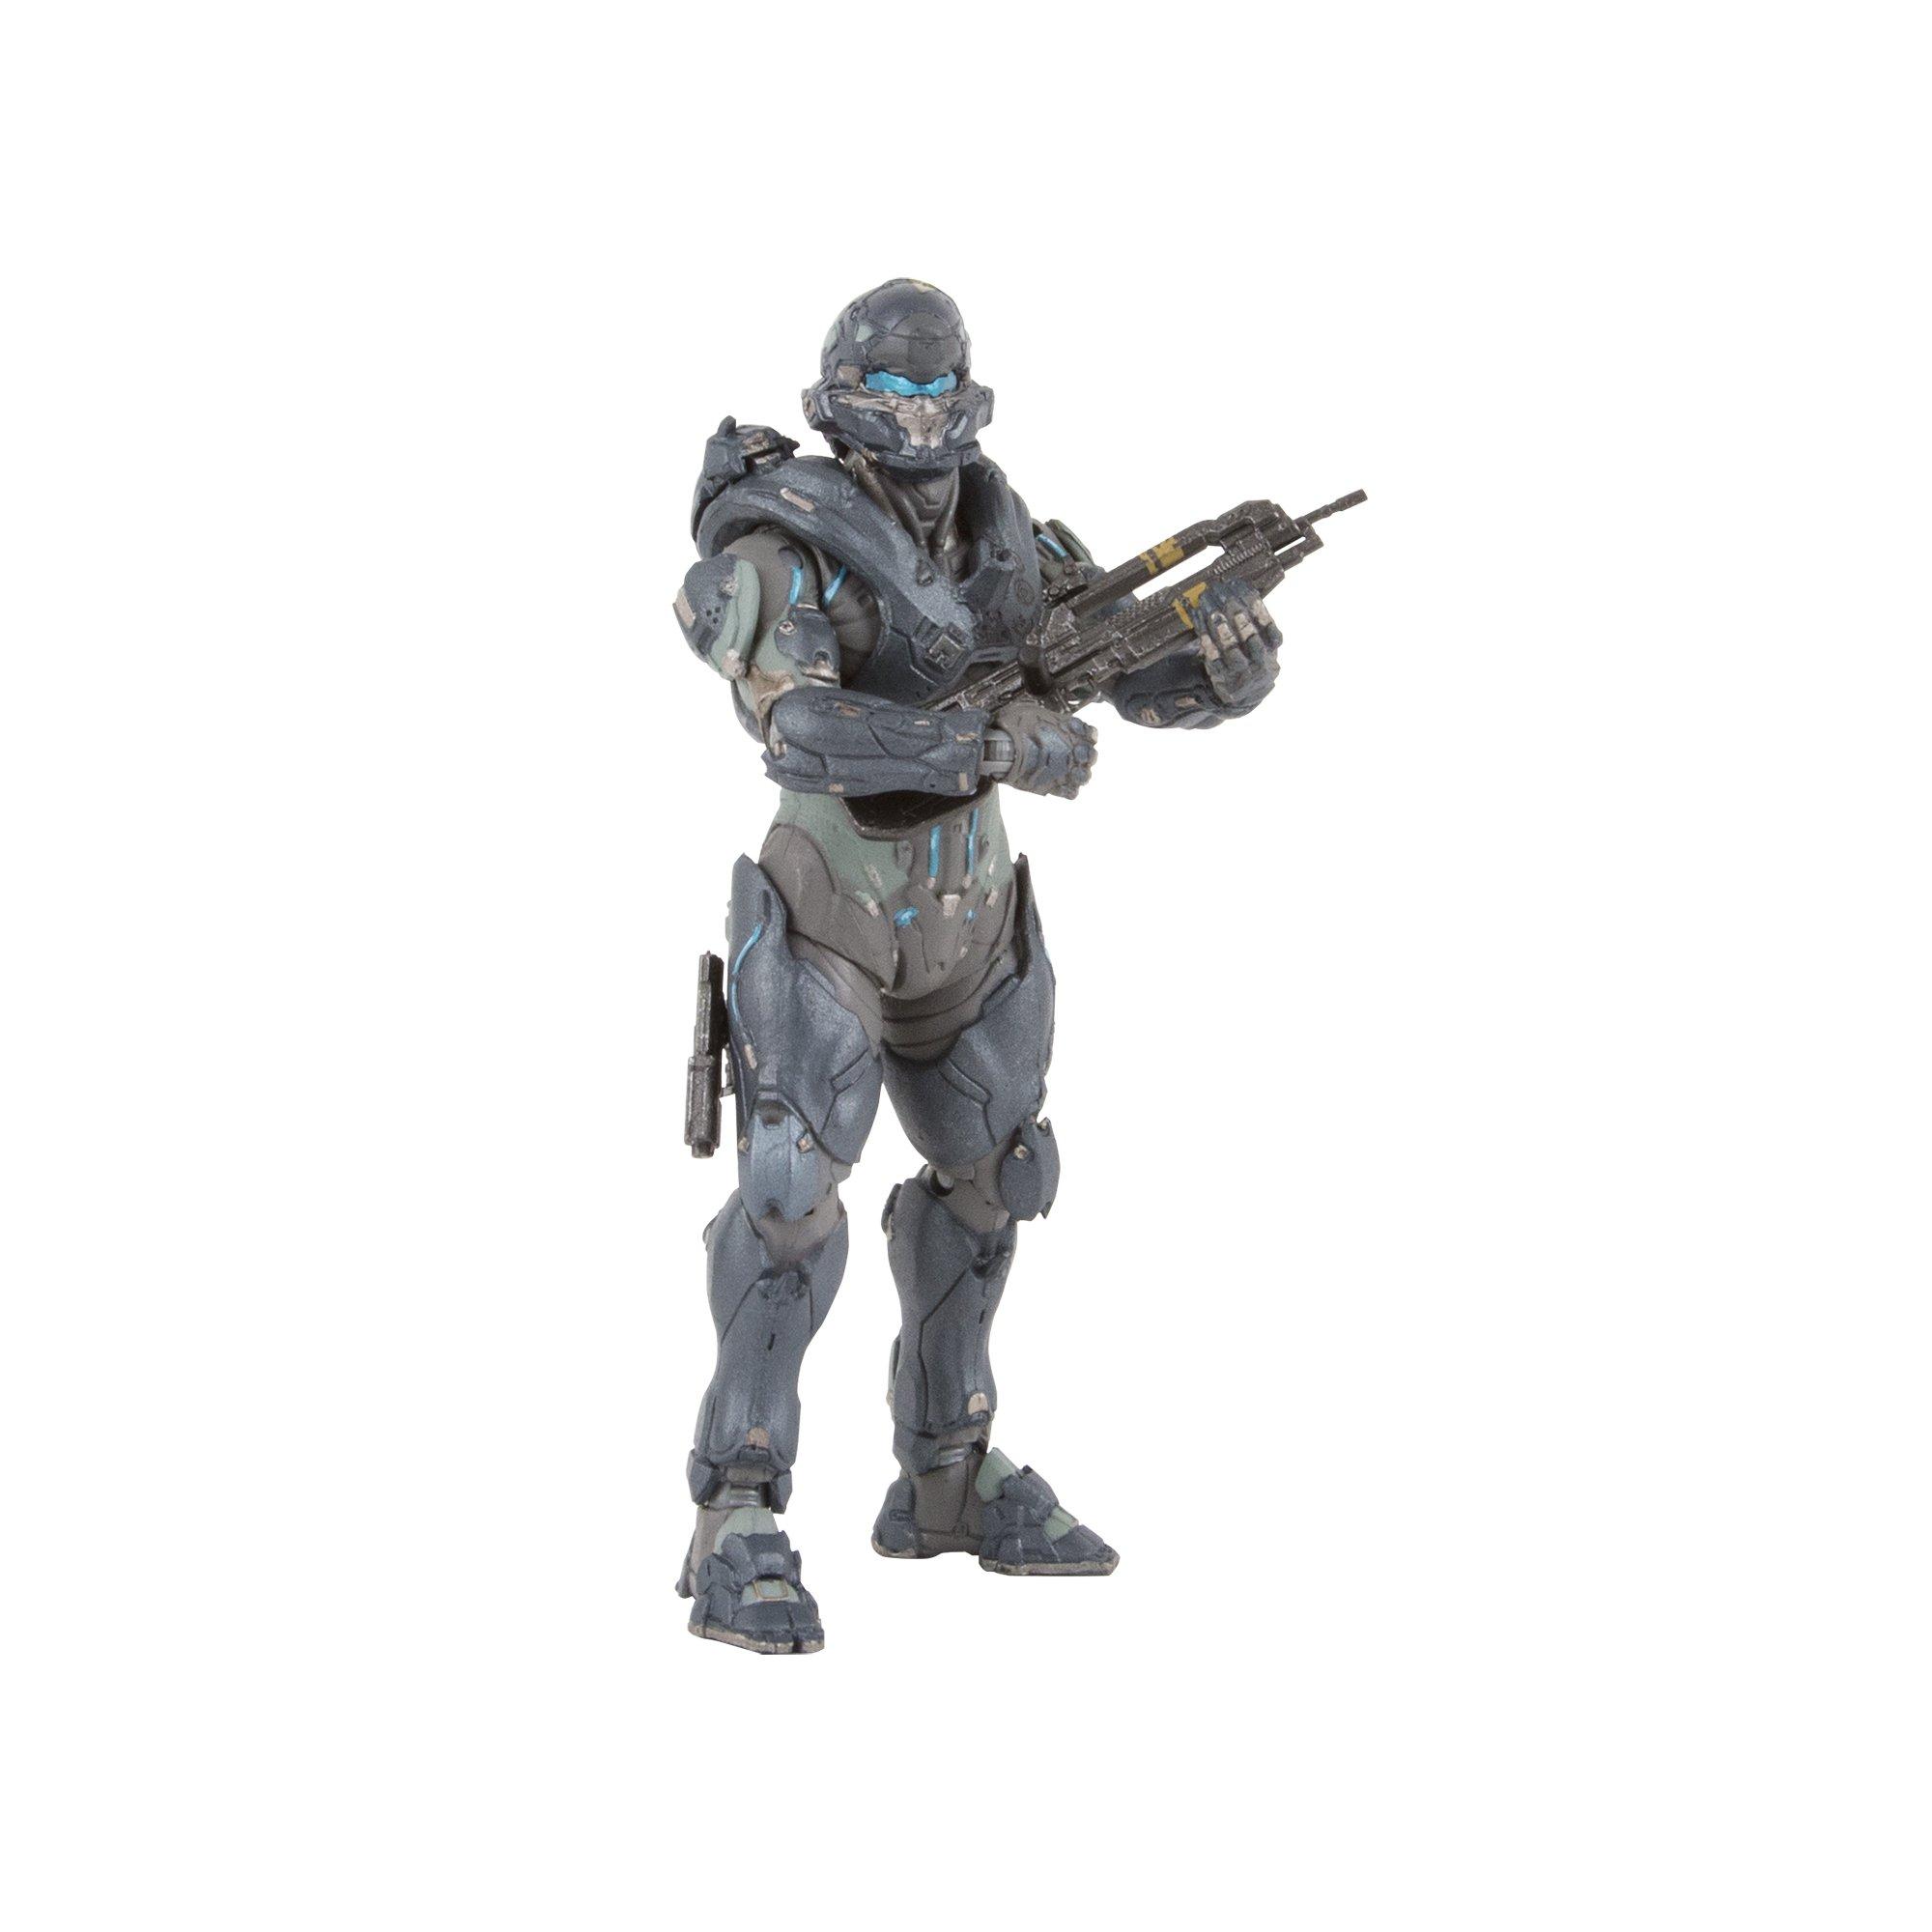 McFarlane Halo 5: Guardians Series 1 Spartan Locke Action Figure